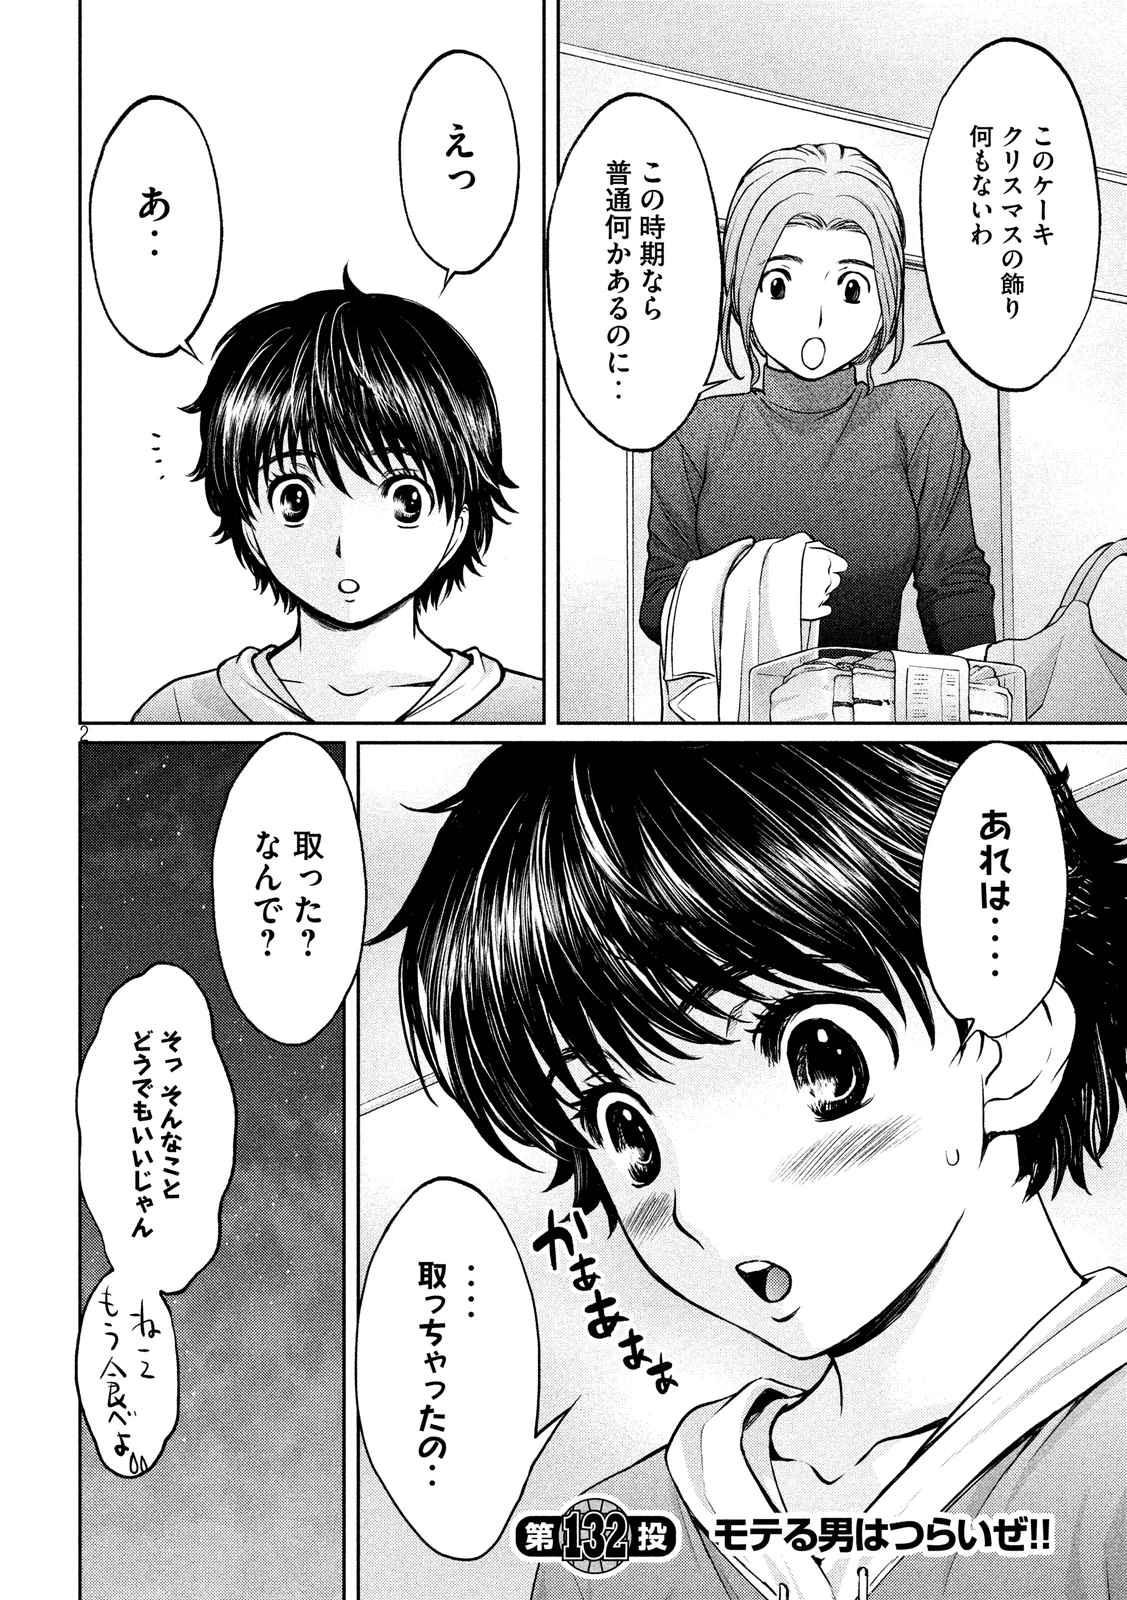 Hantsu x Trash - Chapter 132 - Page 2